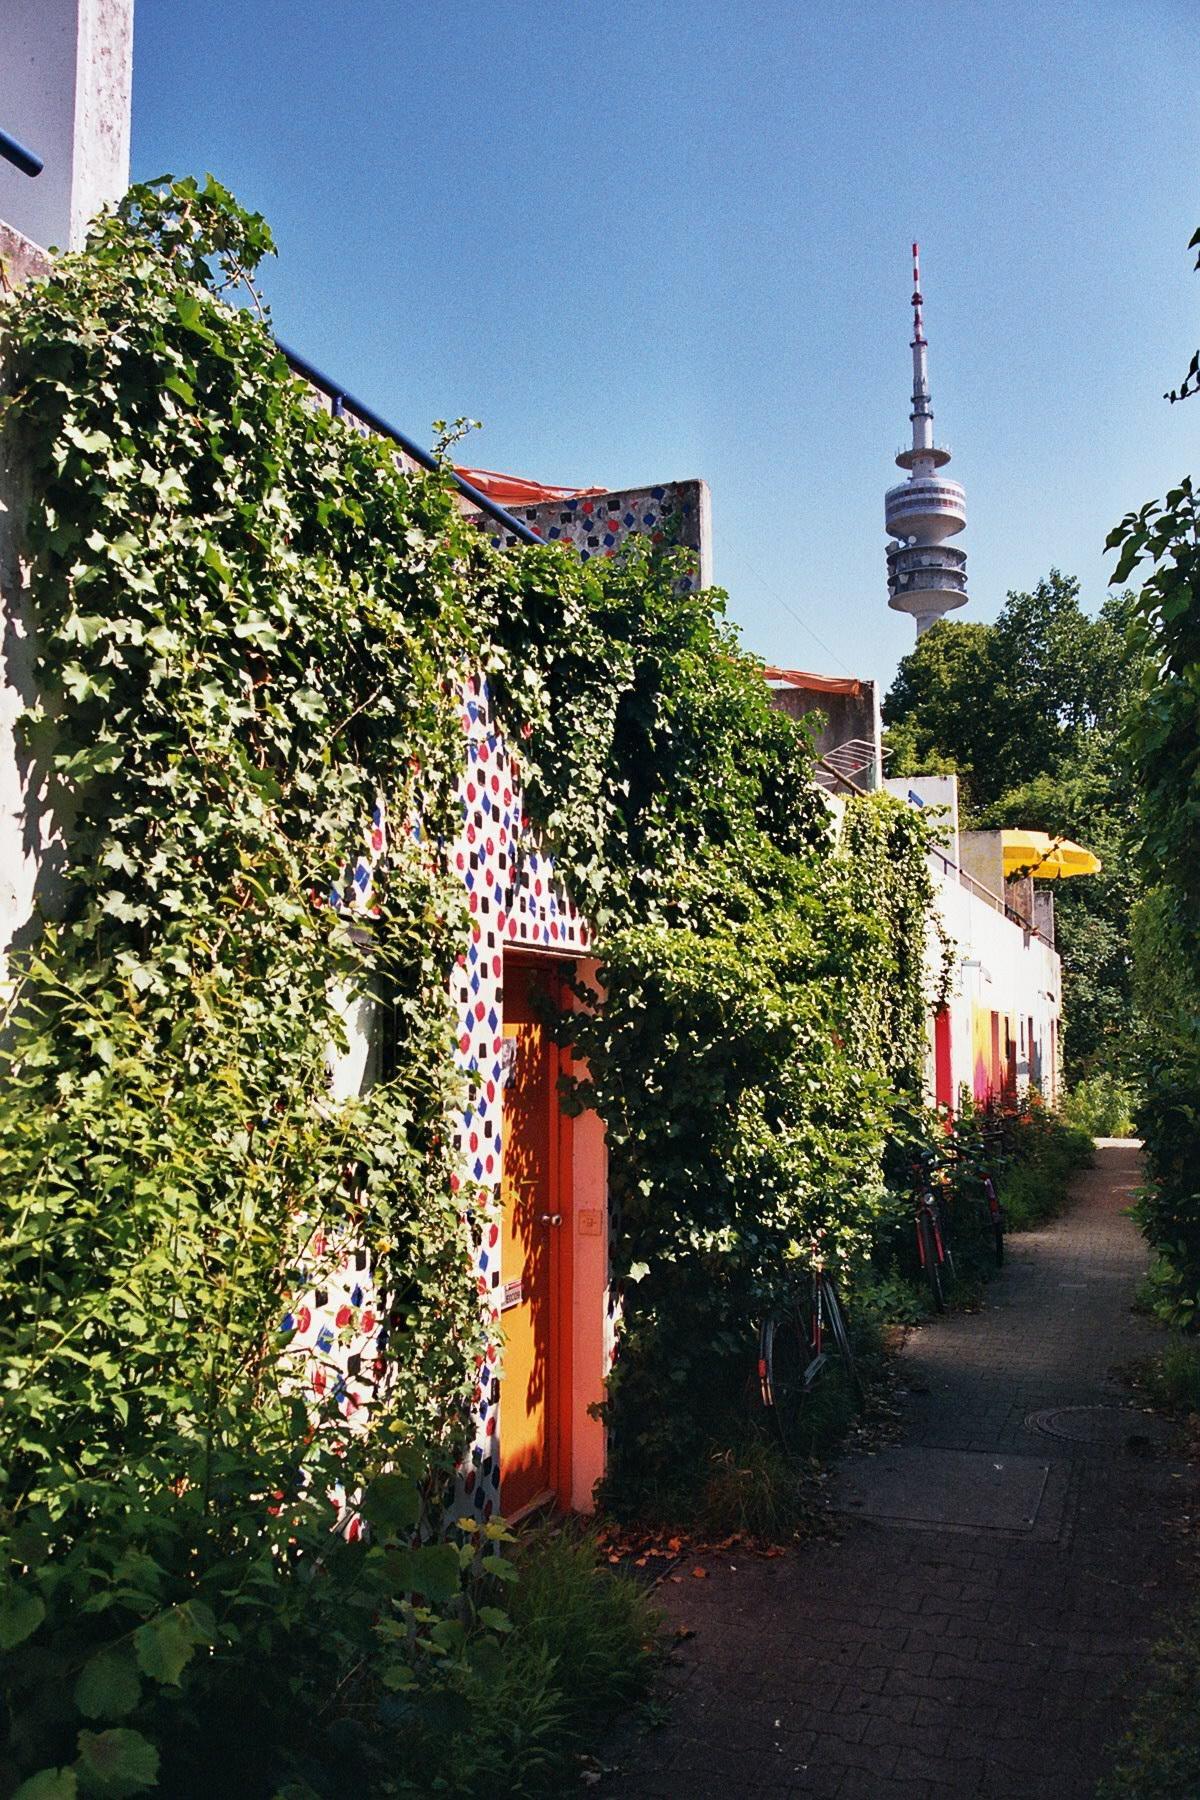 Altbau vs. Neubau – war das Bungalowdorf früher attraktiver?